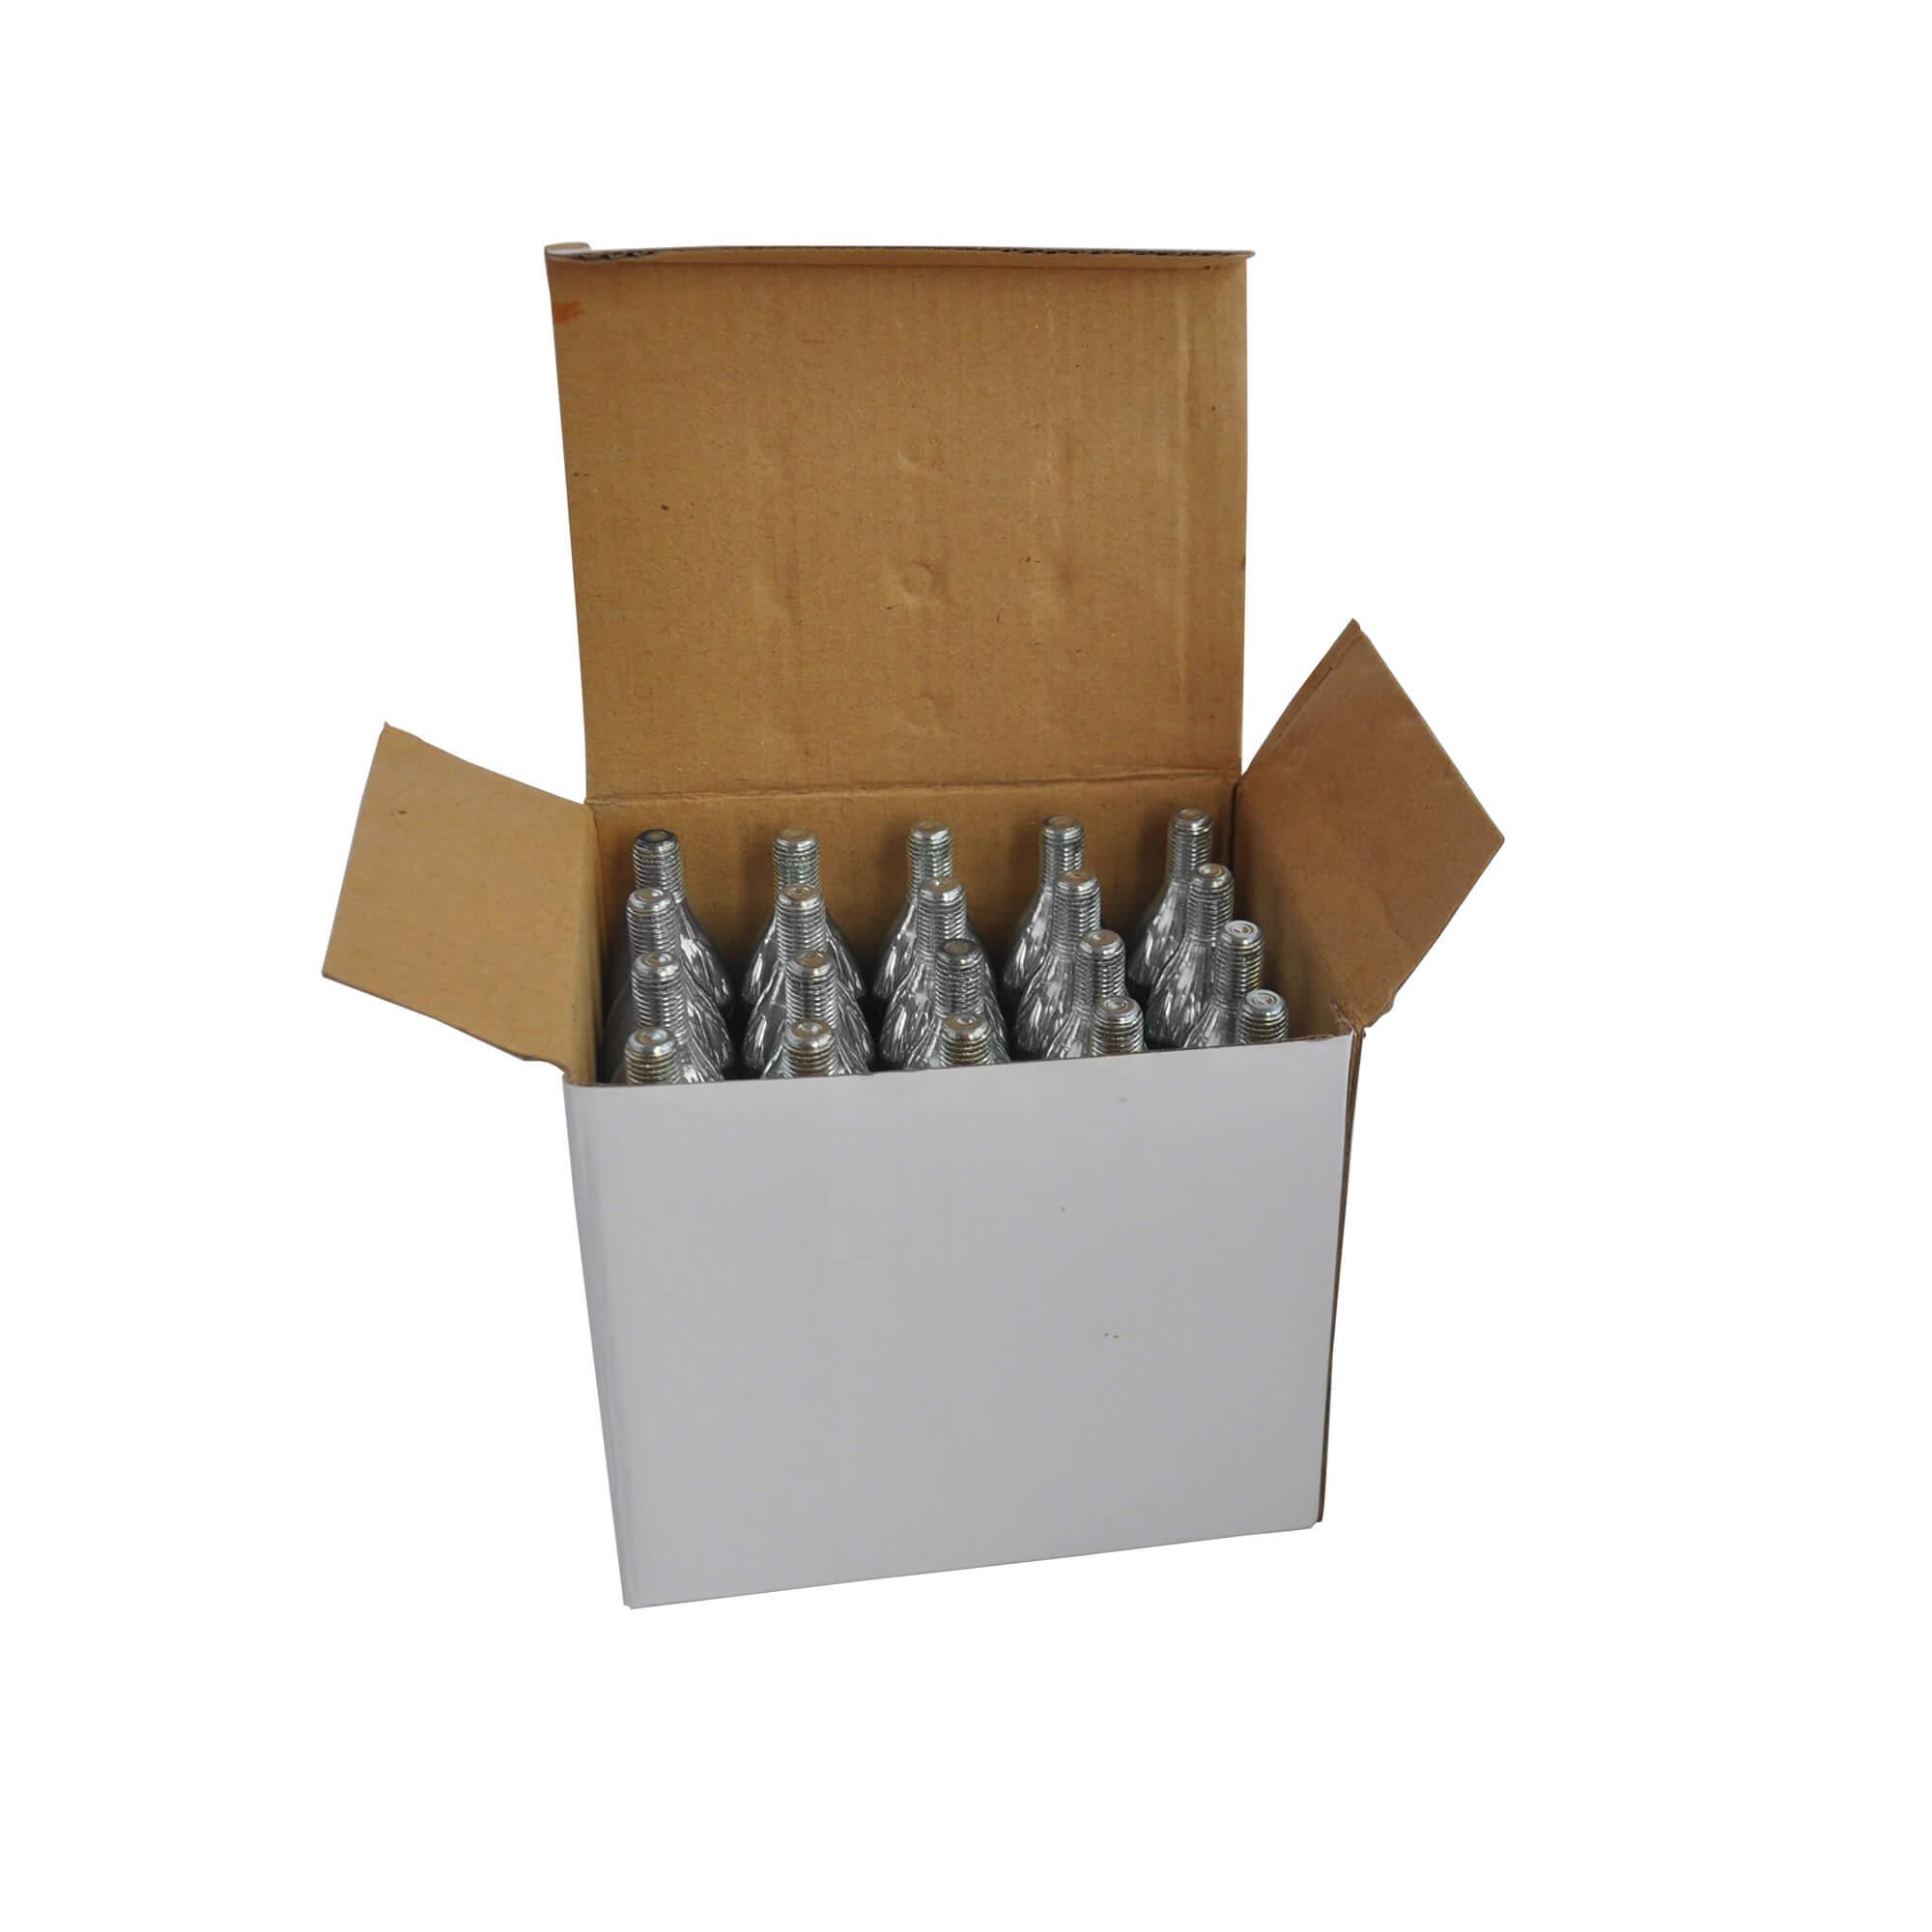 Mini Cilindro de CO2 Alimentício para My Keg - 25g pack de 20